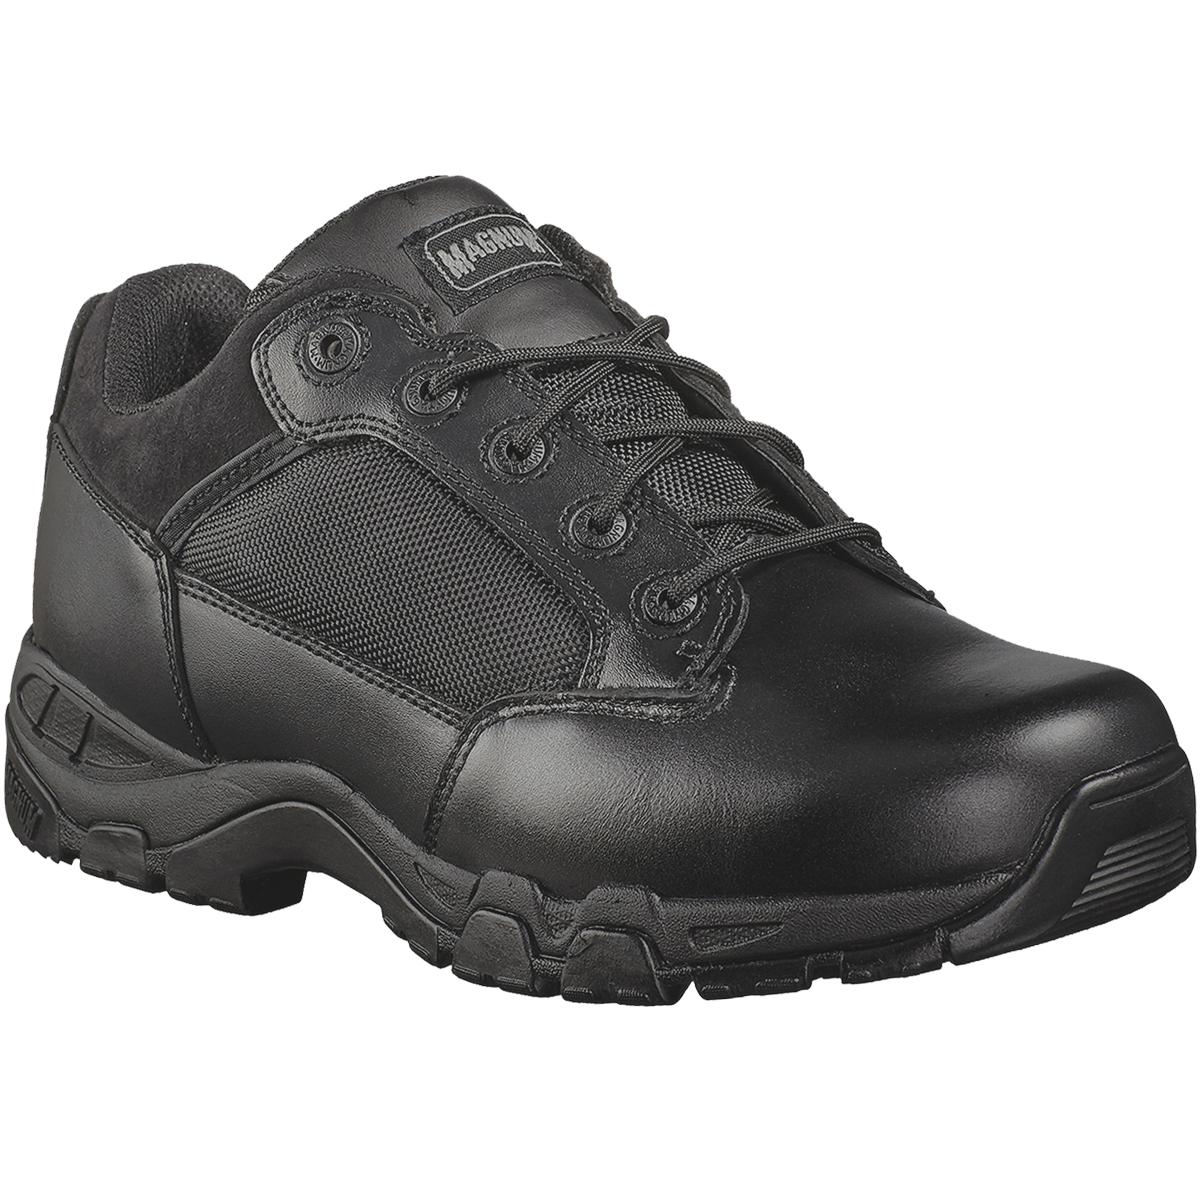 Magnum Viper Pro 3 0 Boots Mens Police Security Patrol